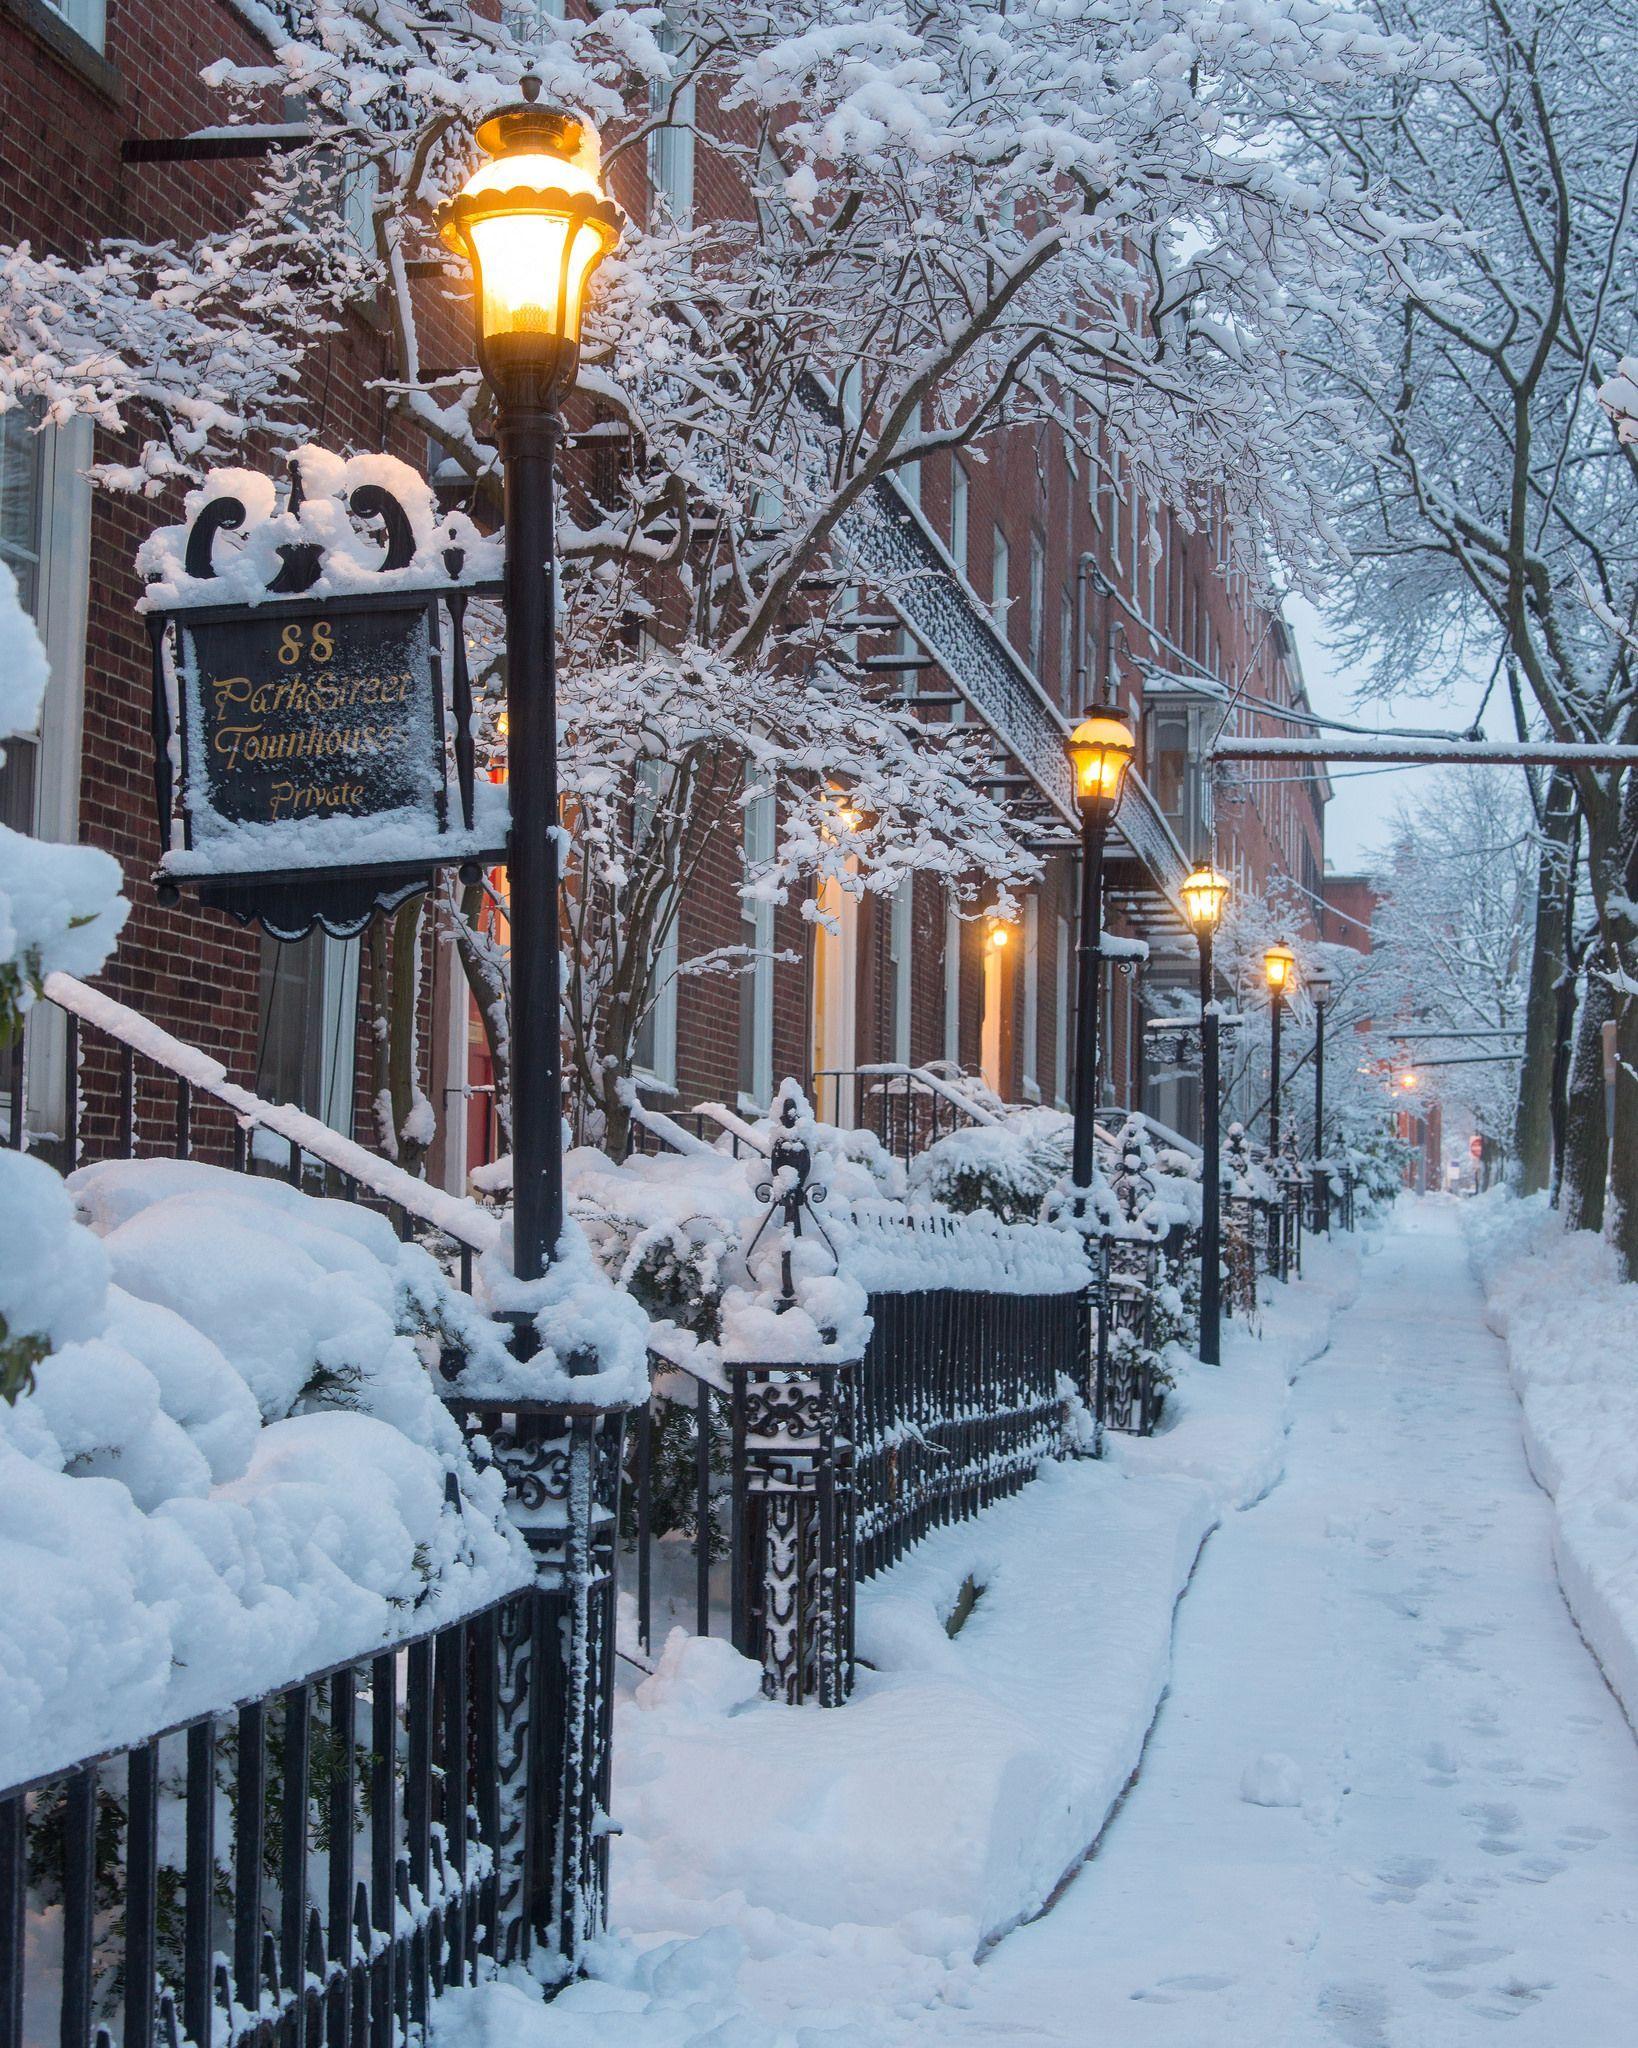 Winter Morning After Snow Storm on Park Street, Vertical #photosofnature Explore...